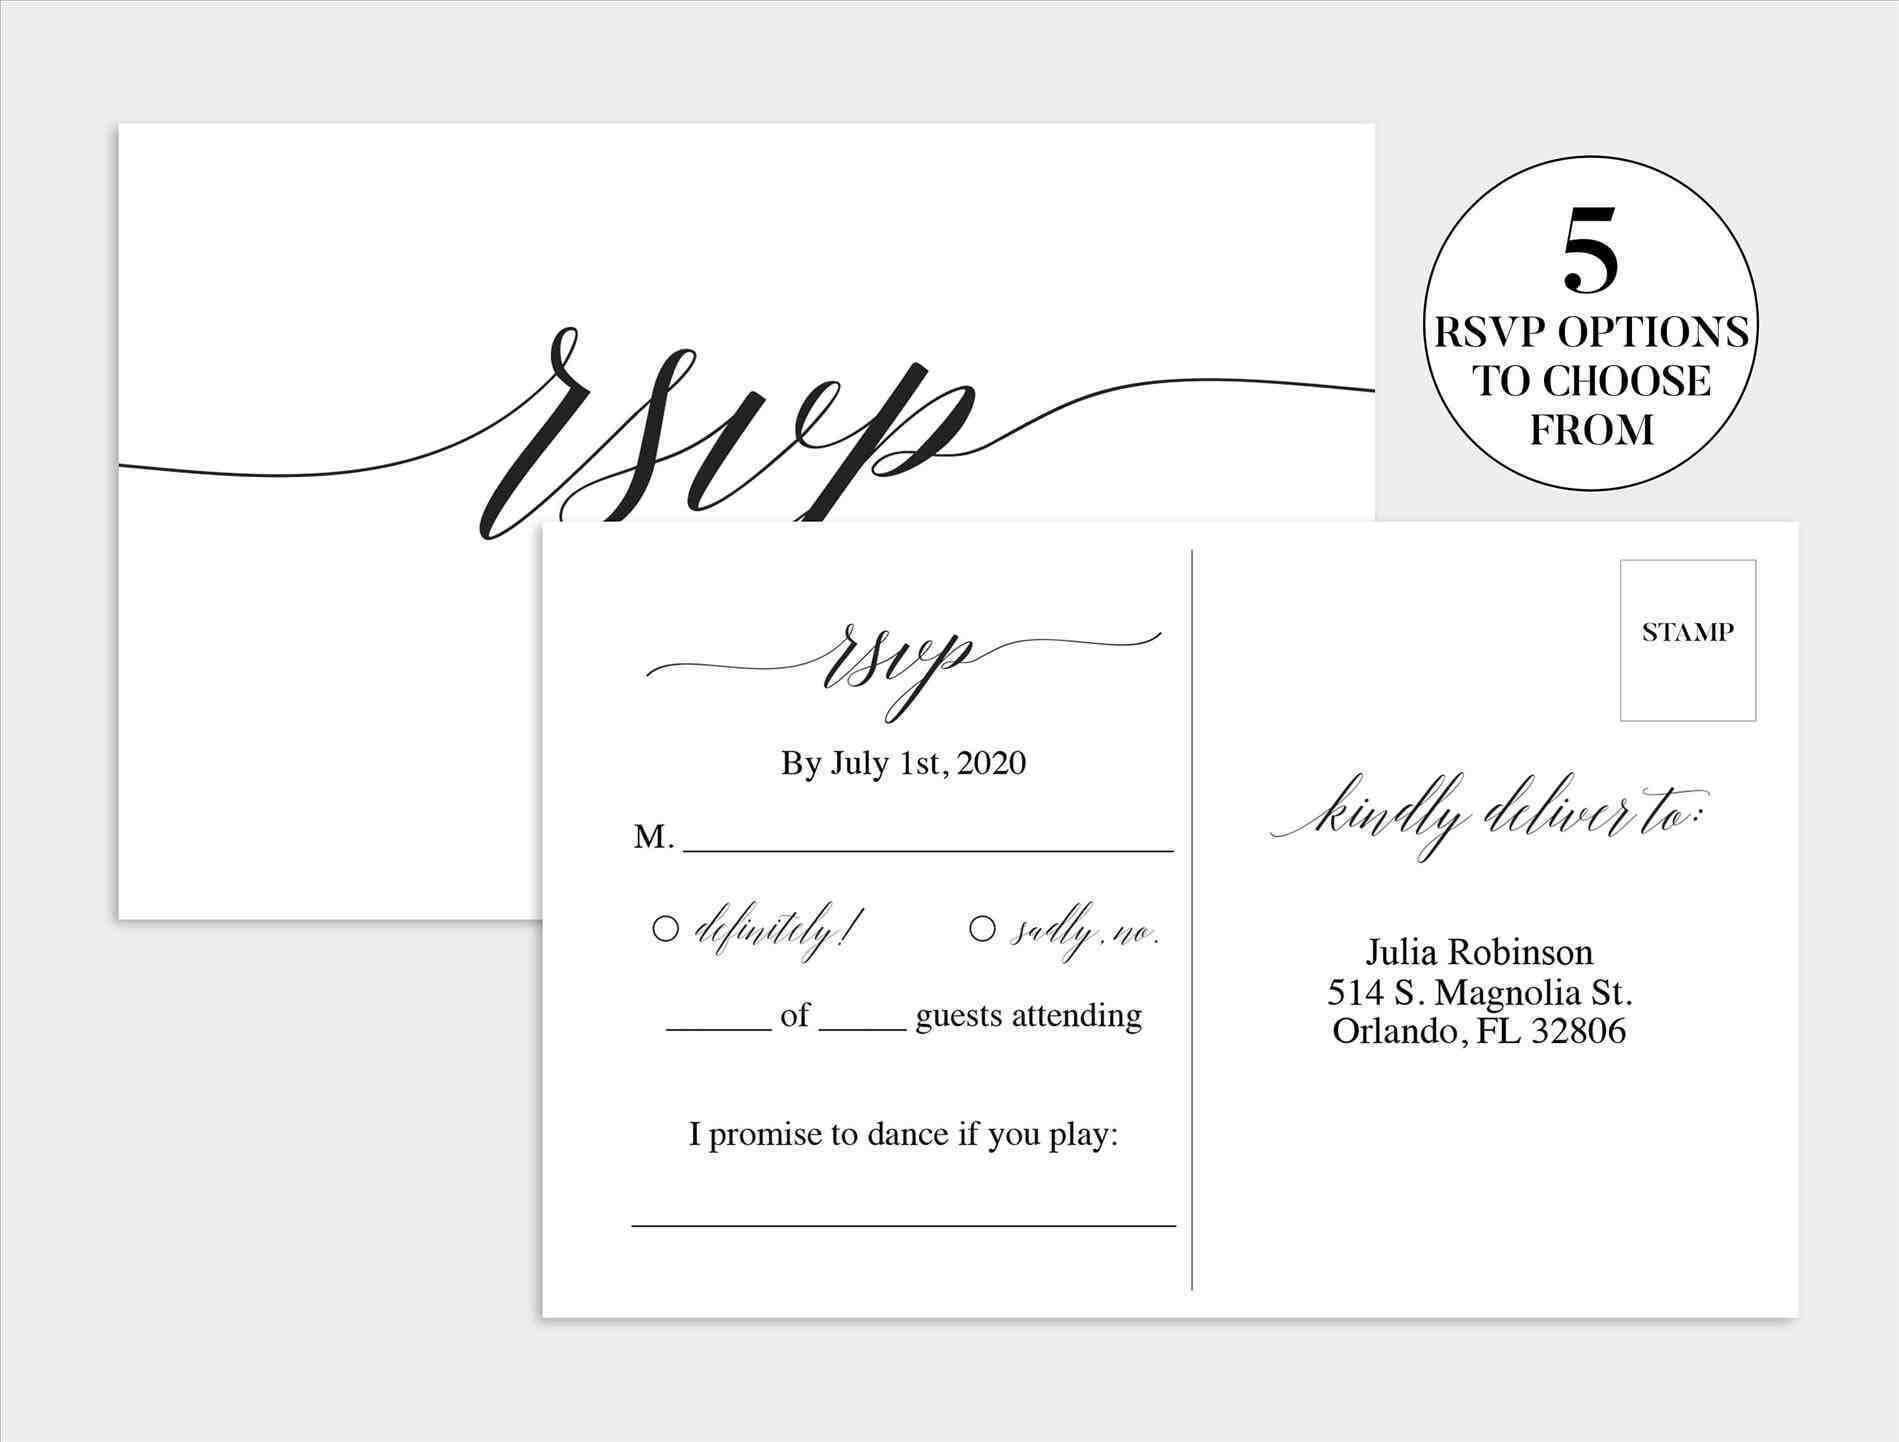 Pinjoanna Keysa On Free Tamplate | Wedding Reply Cards Pertaining To Free Printable Wedding Rsvp Card Templates